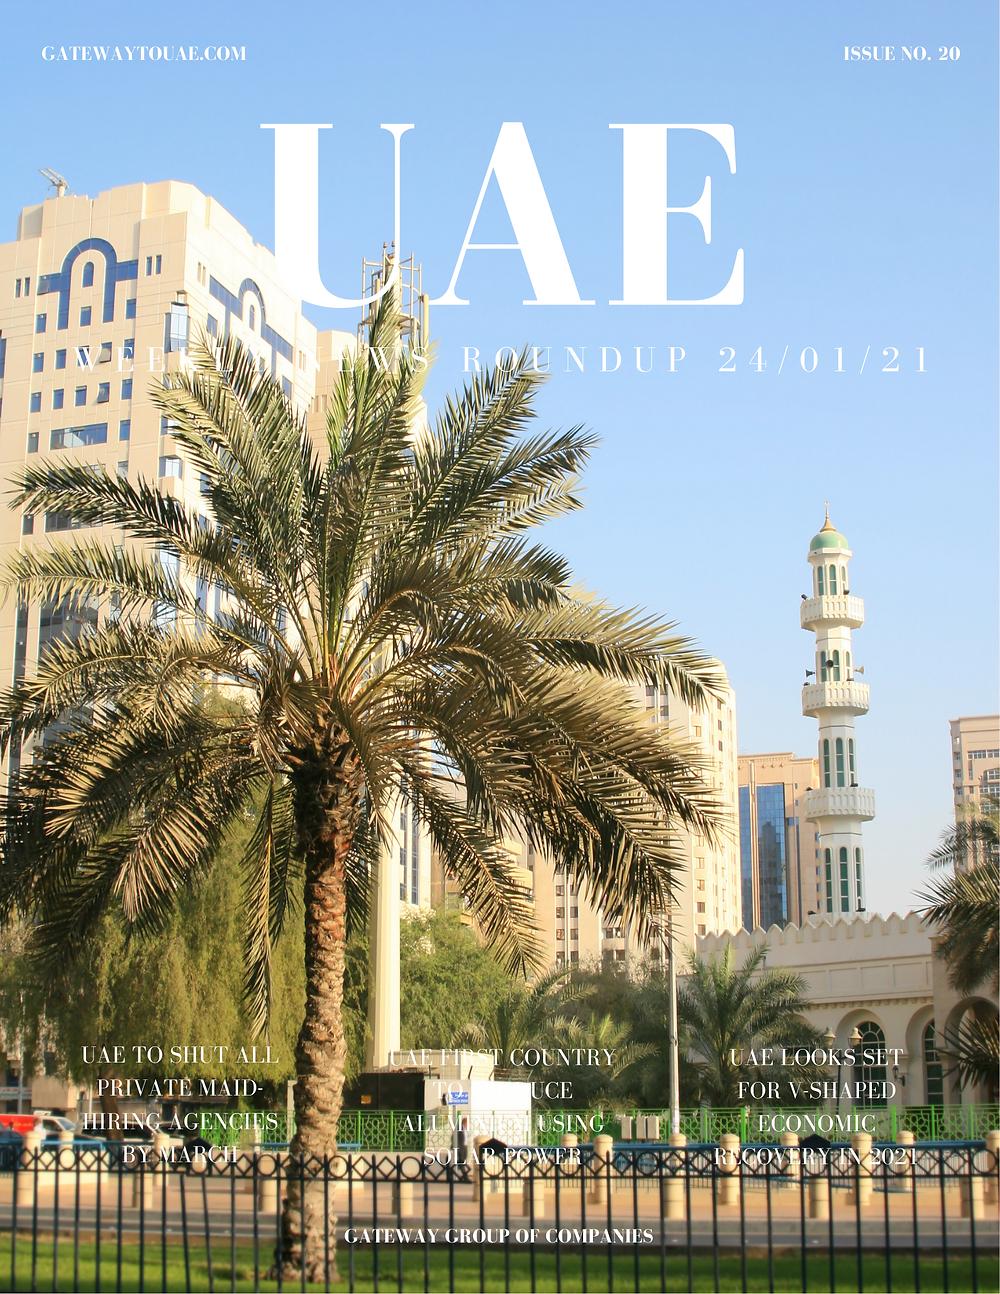 UAE business news headlines 24th January 2021 Issue 20 Gateway Group Of Companies Abu Dhabi Dubai